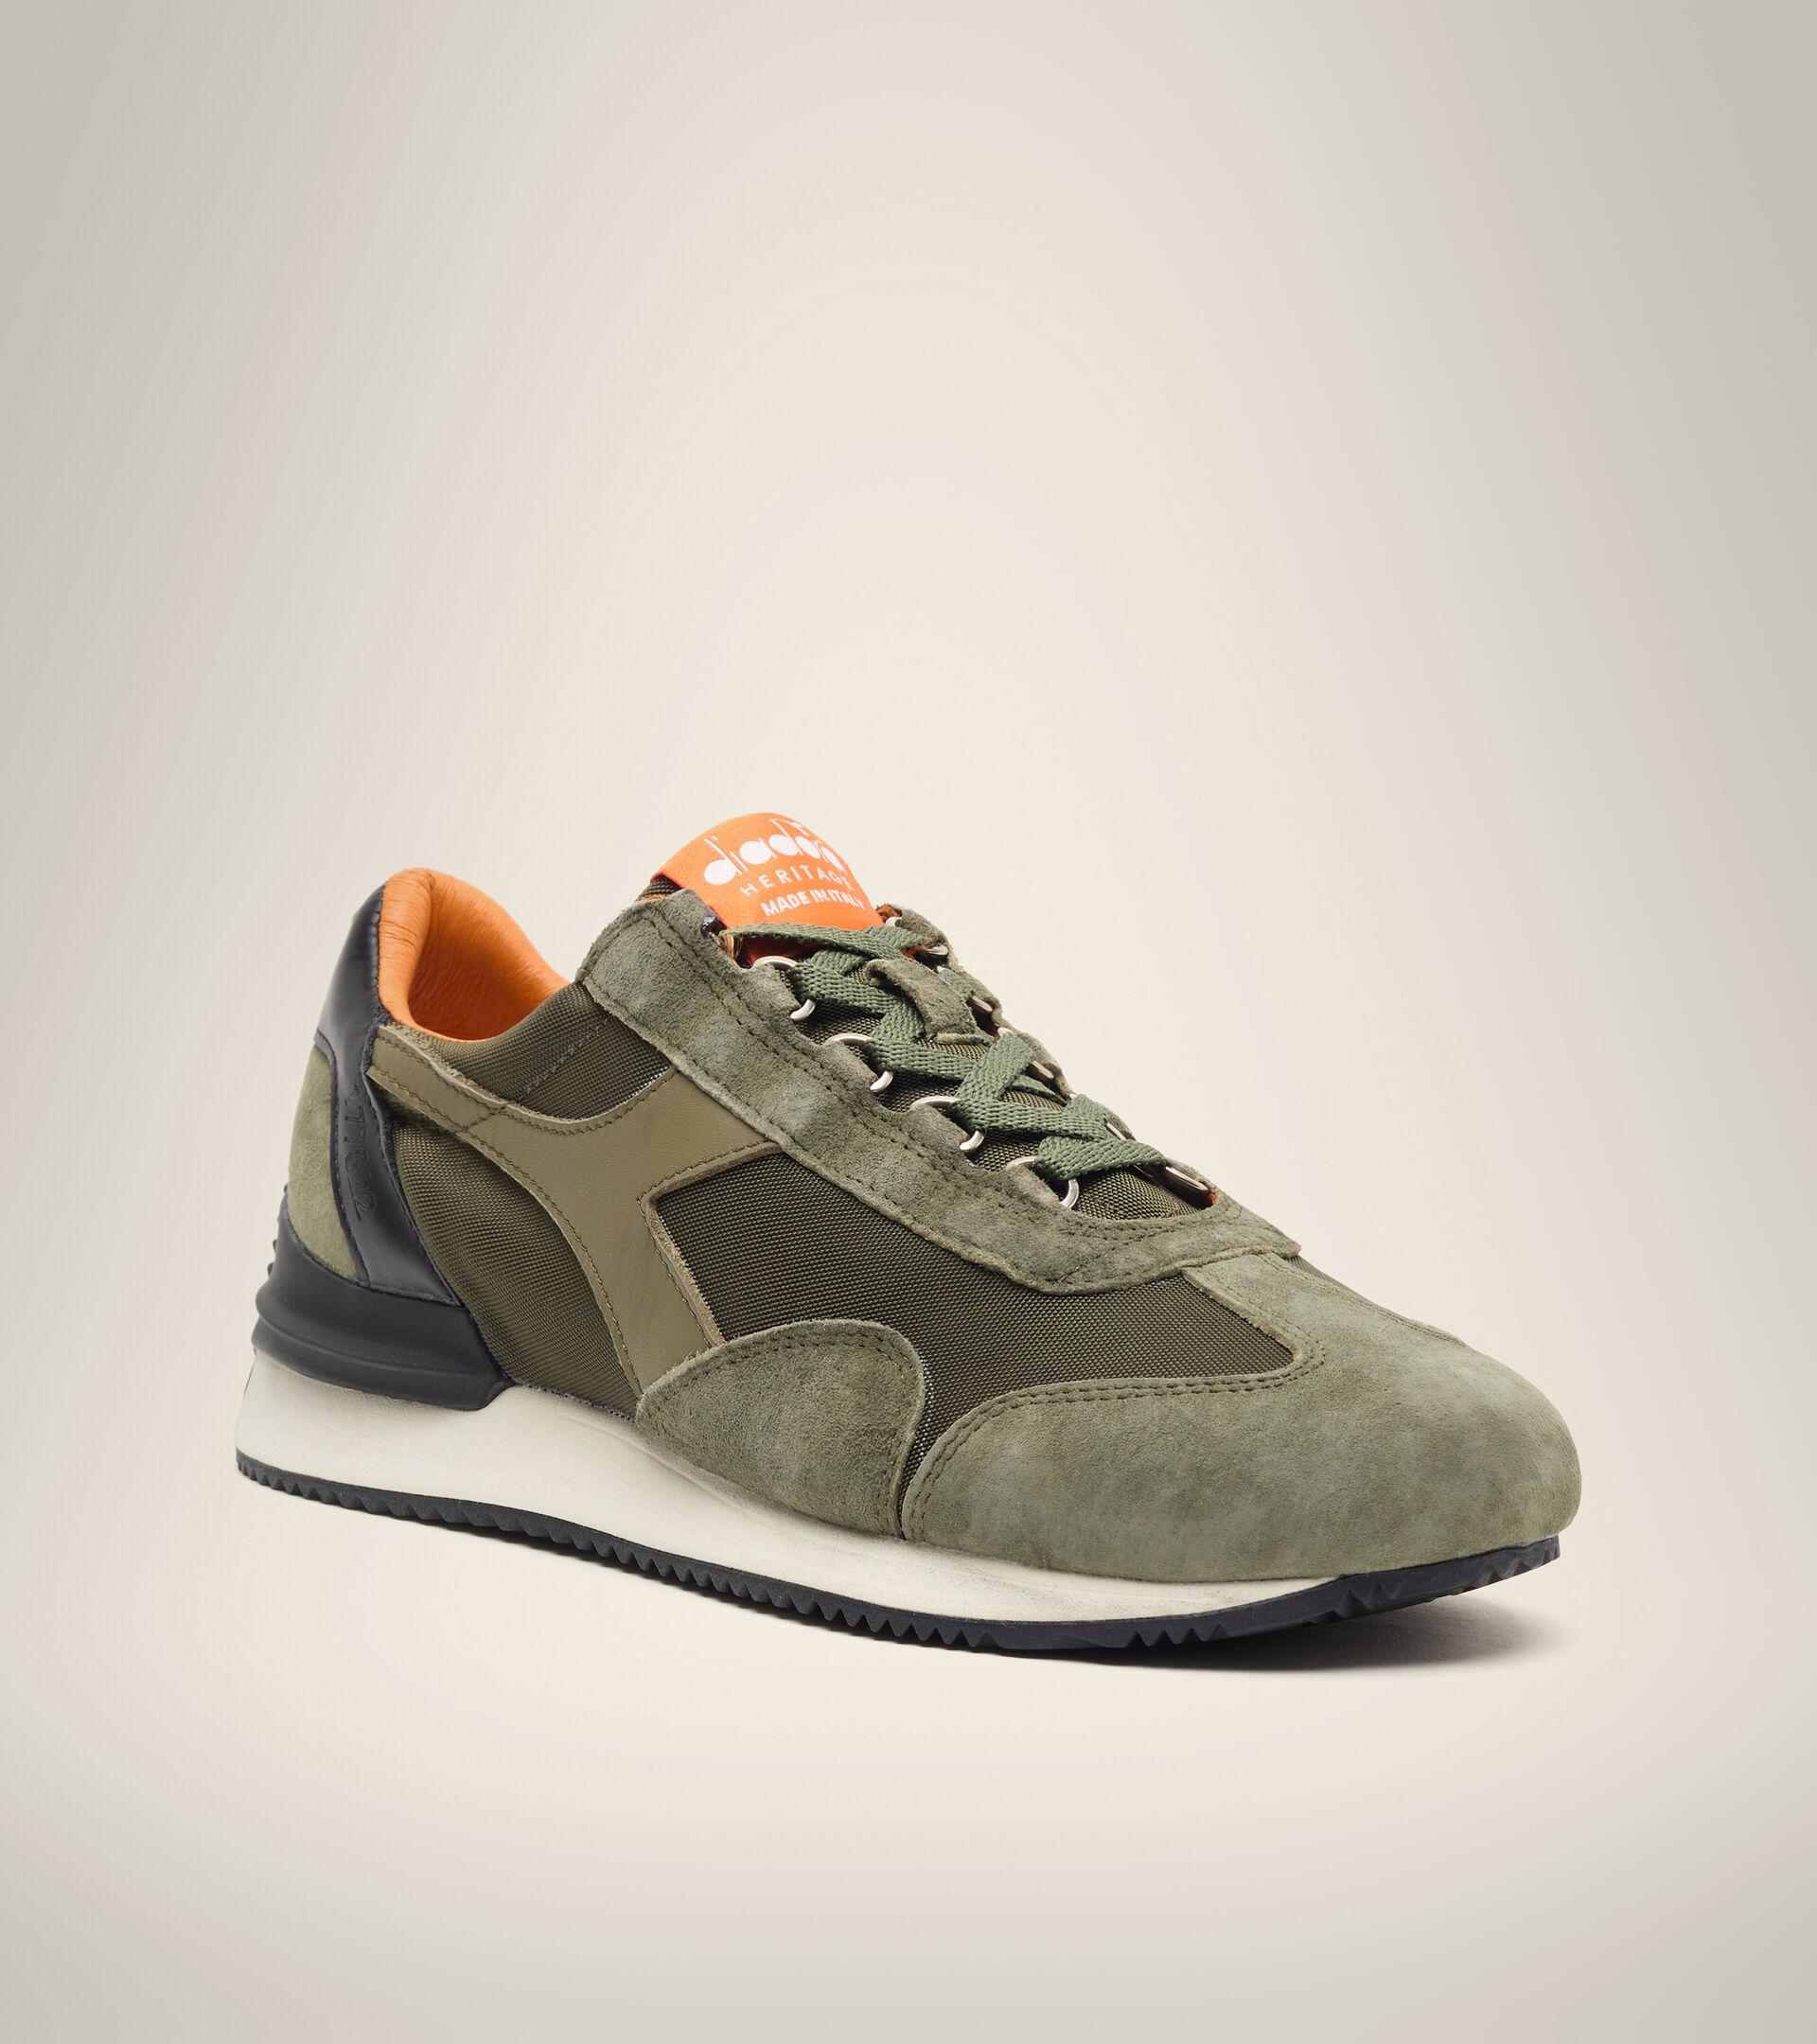 Footwear Heritage UNISEX EQUIPE MAD ITALIA NUBUCK SW VERDE OLIVINE Diadora